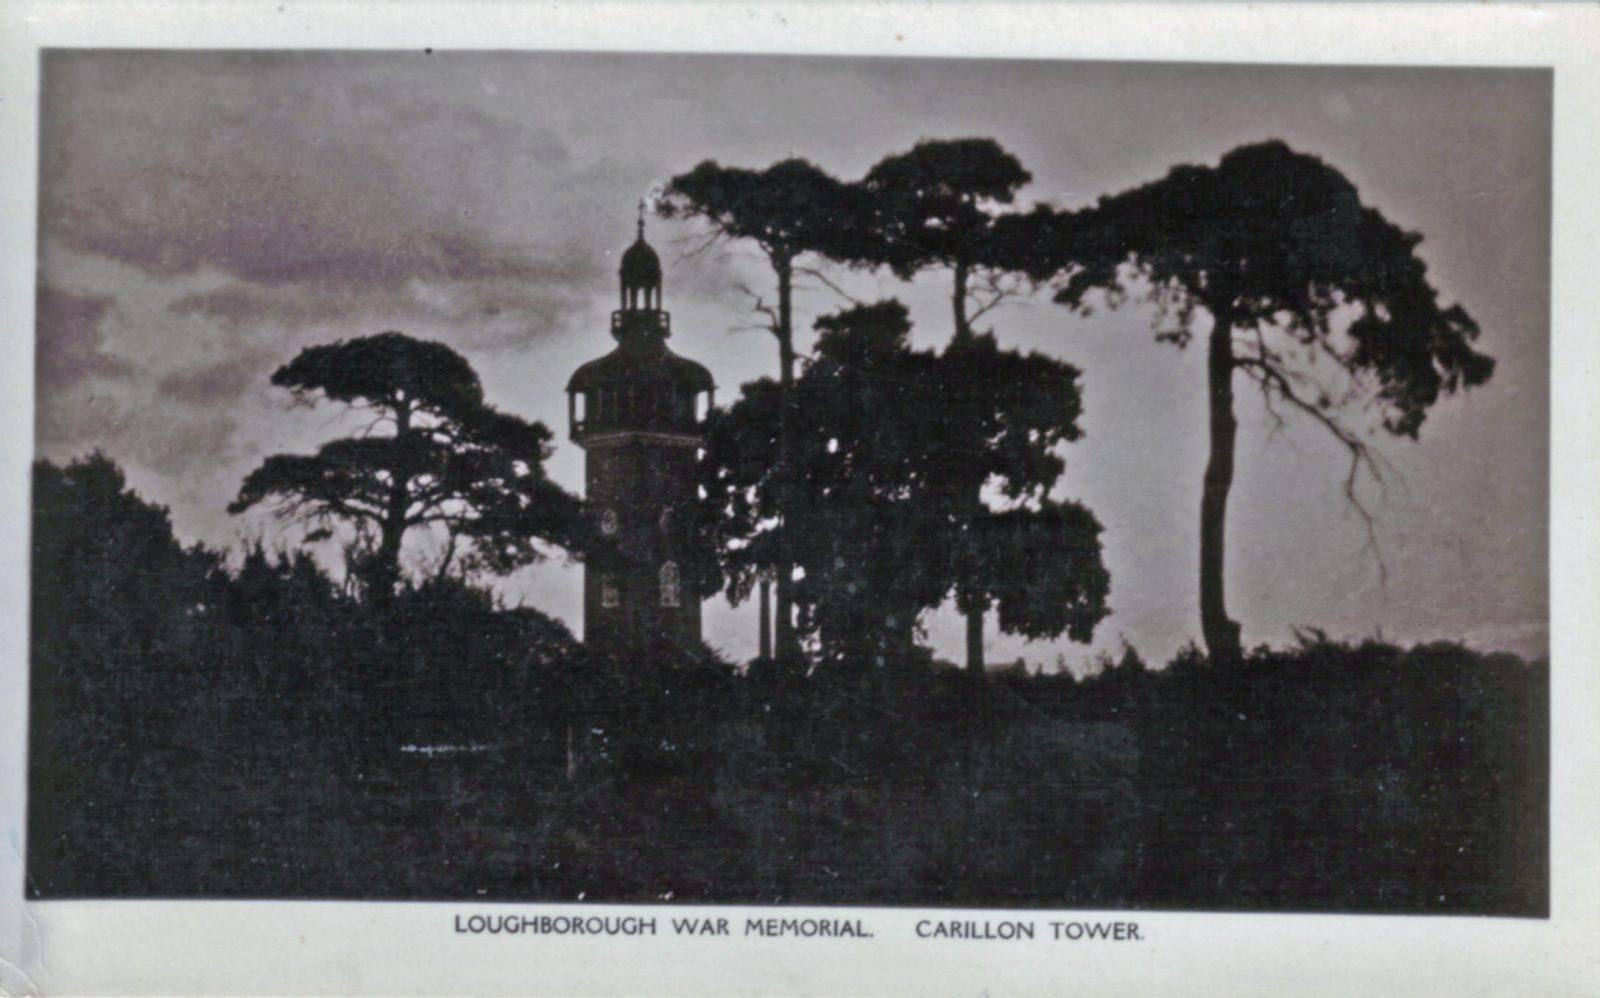 Queens Park, Loughborough. Undated: Loughborough war memorial, Carillon tower. (File:1256)